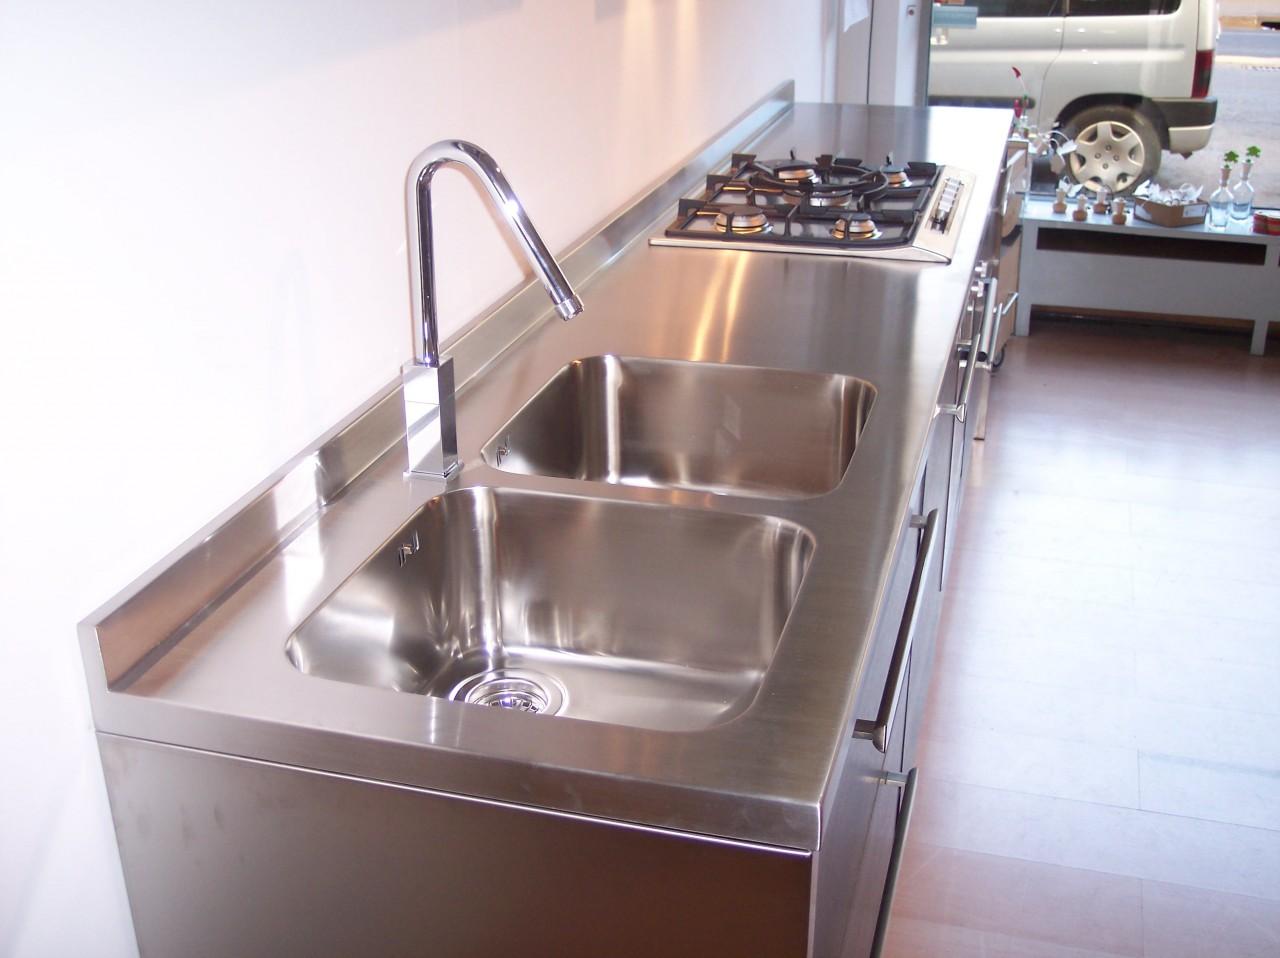 Perché un top in acciaio inox? | Cucine Acciaio Inox